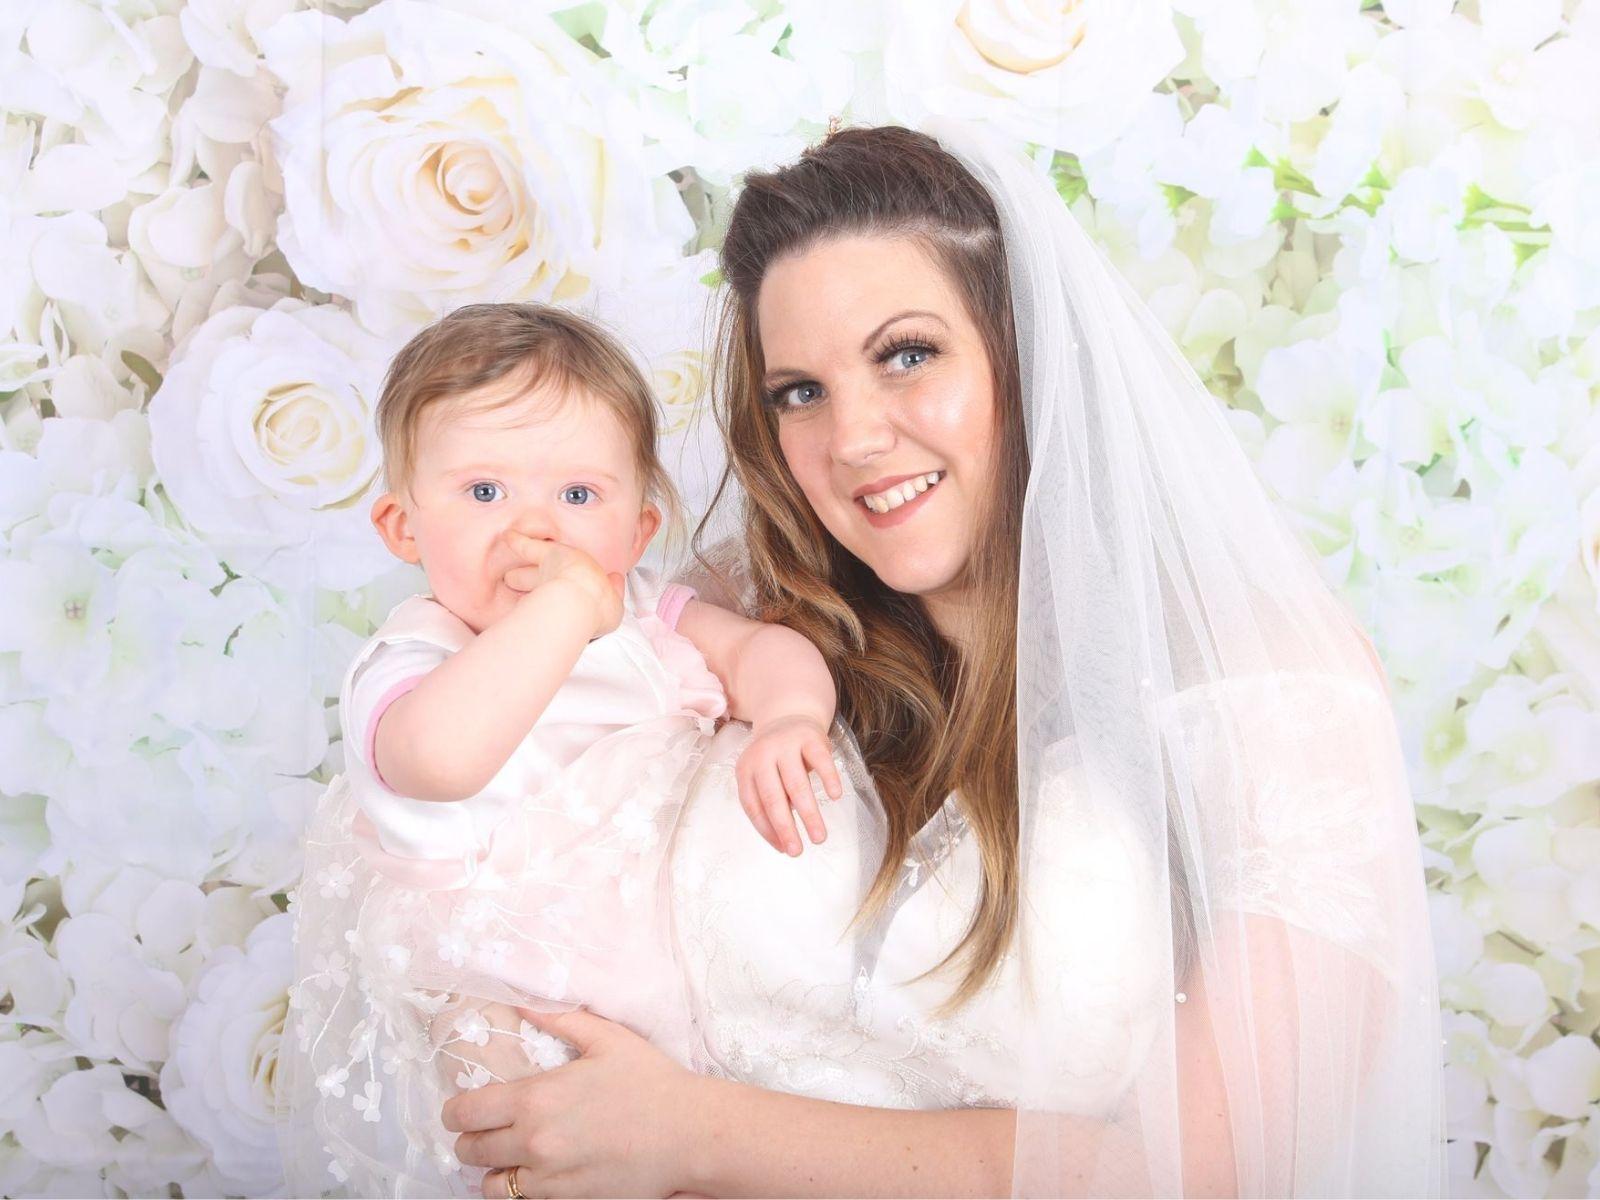 Covid restrictions weddings UK